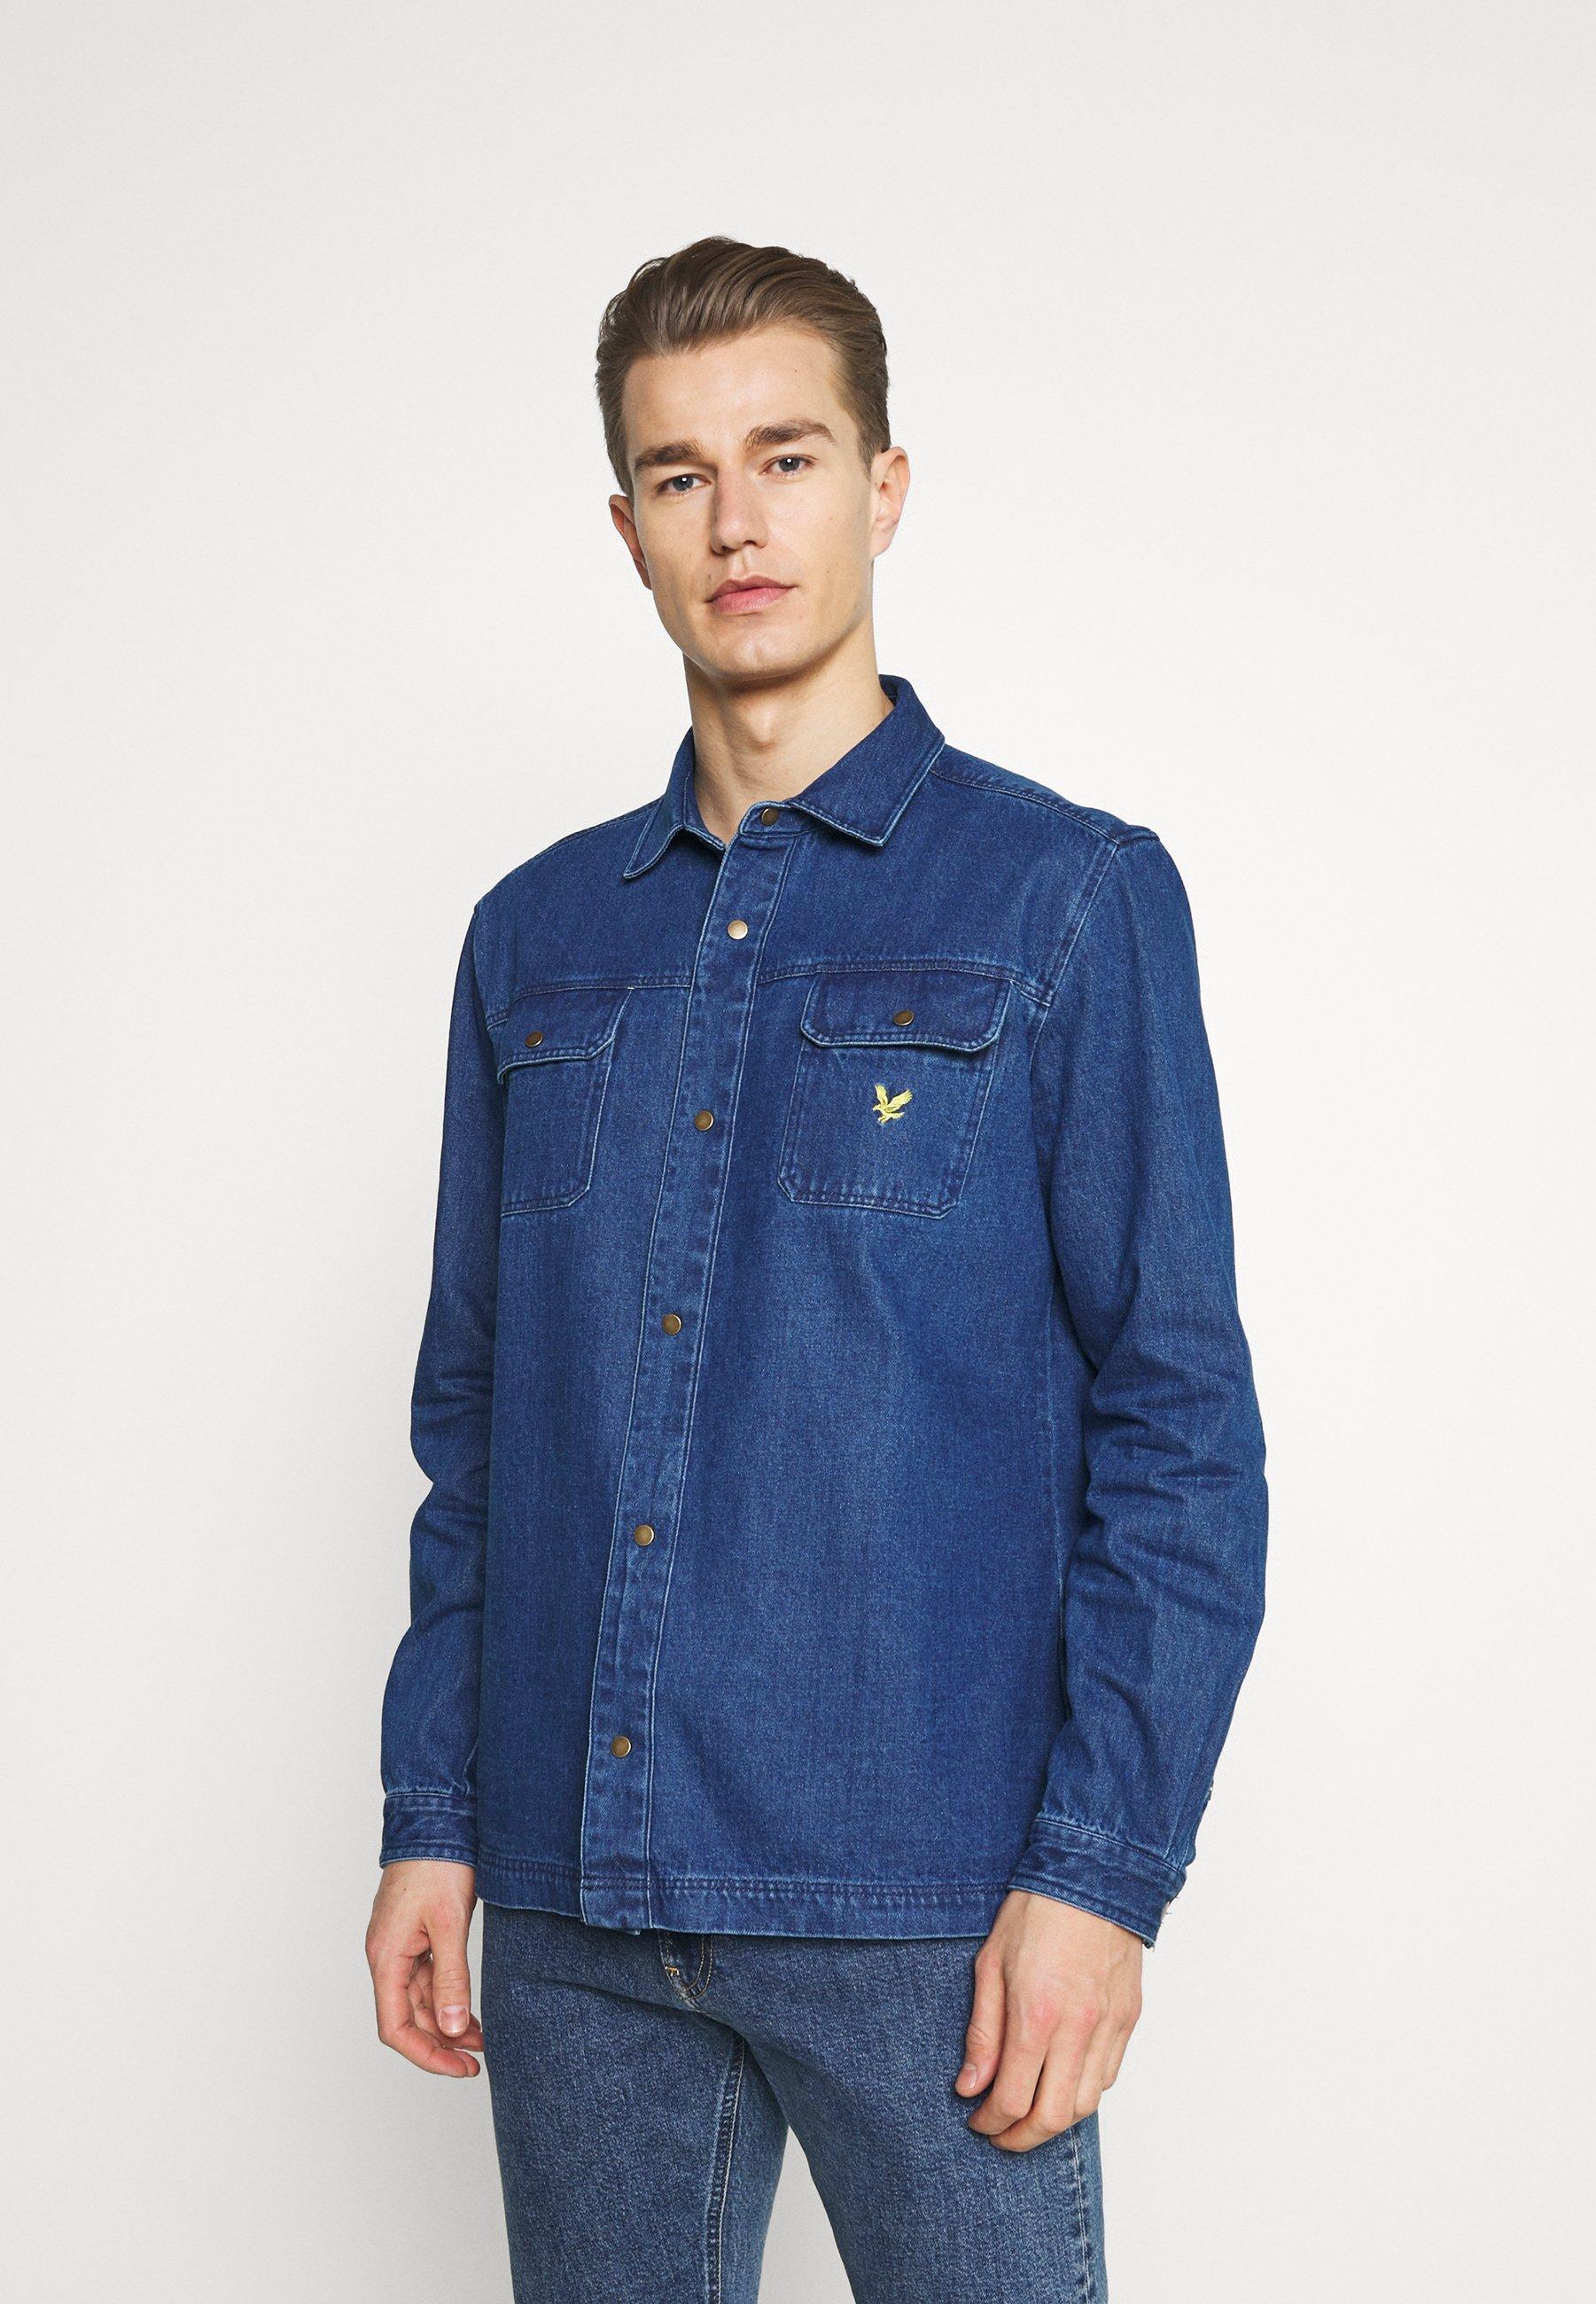 Homme ARCHIVE RELAXED FIT - Veste en jean